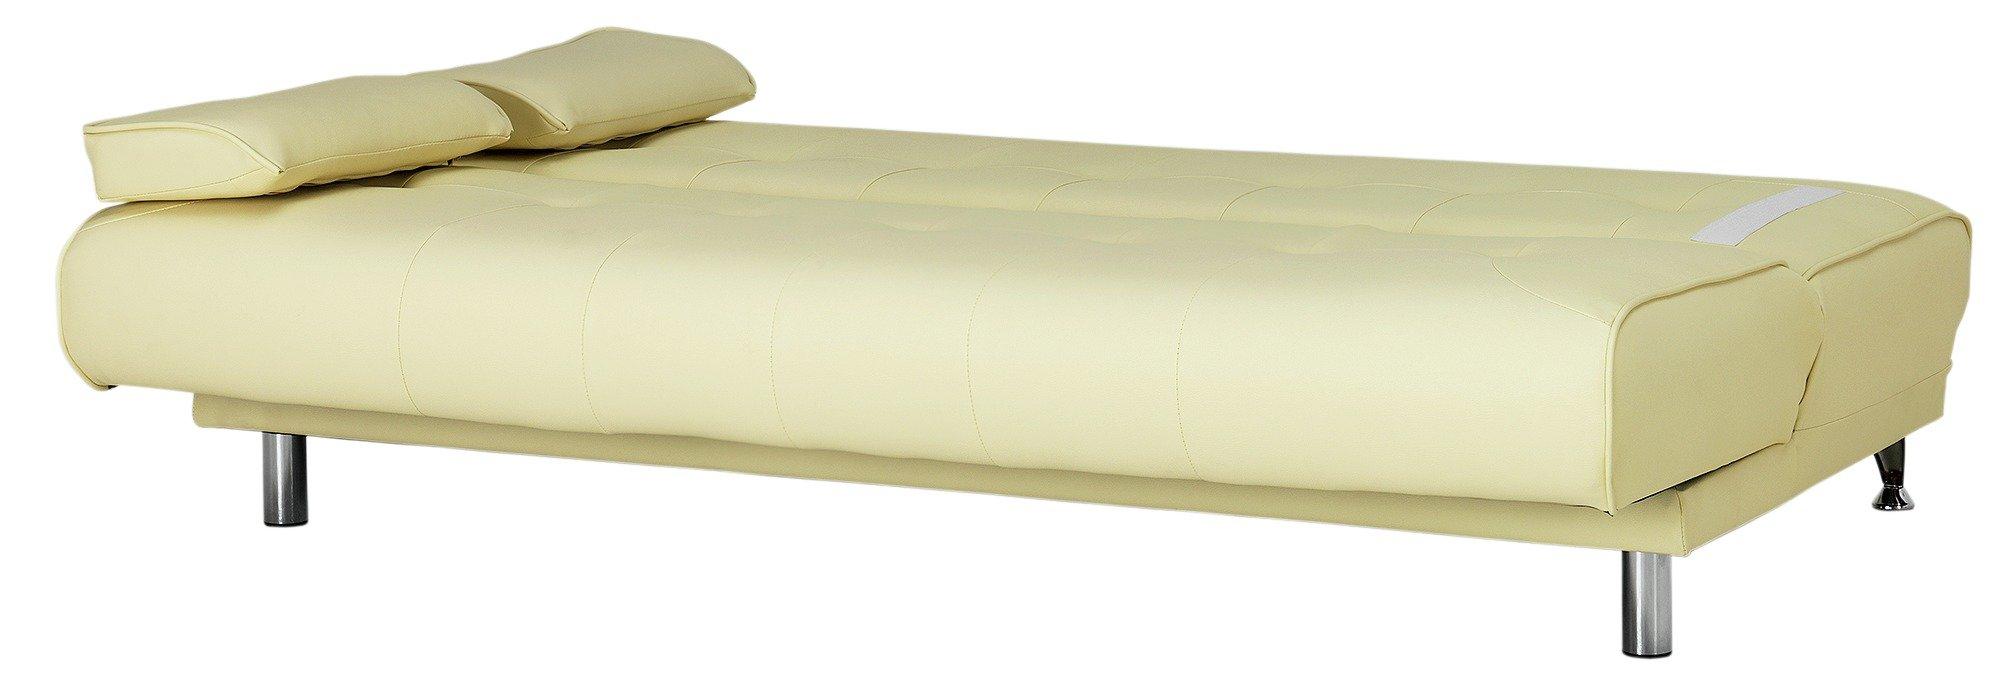 Argos Home Sicily 2 Seater Fabric Clic Clac Sofa Bed - Cream